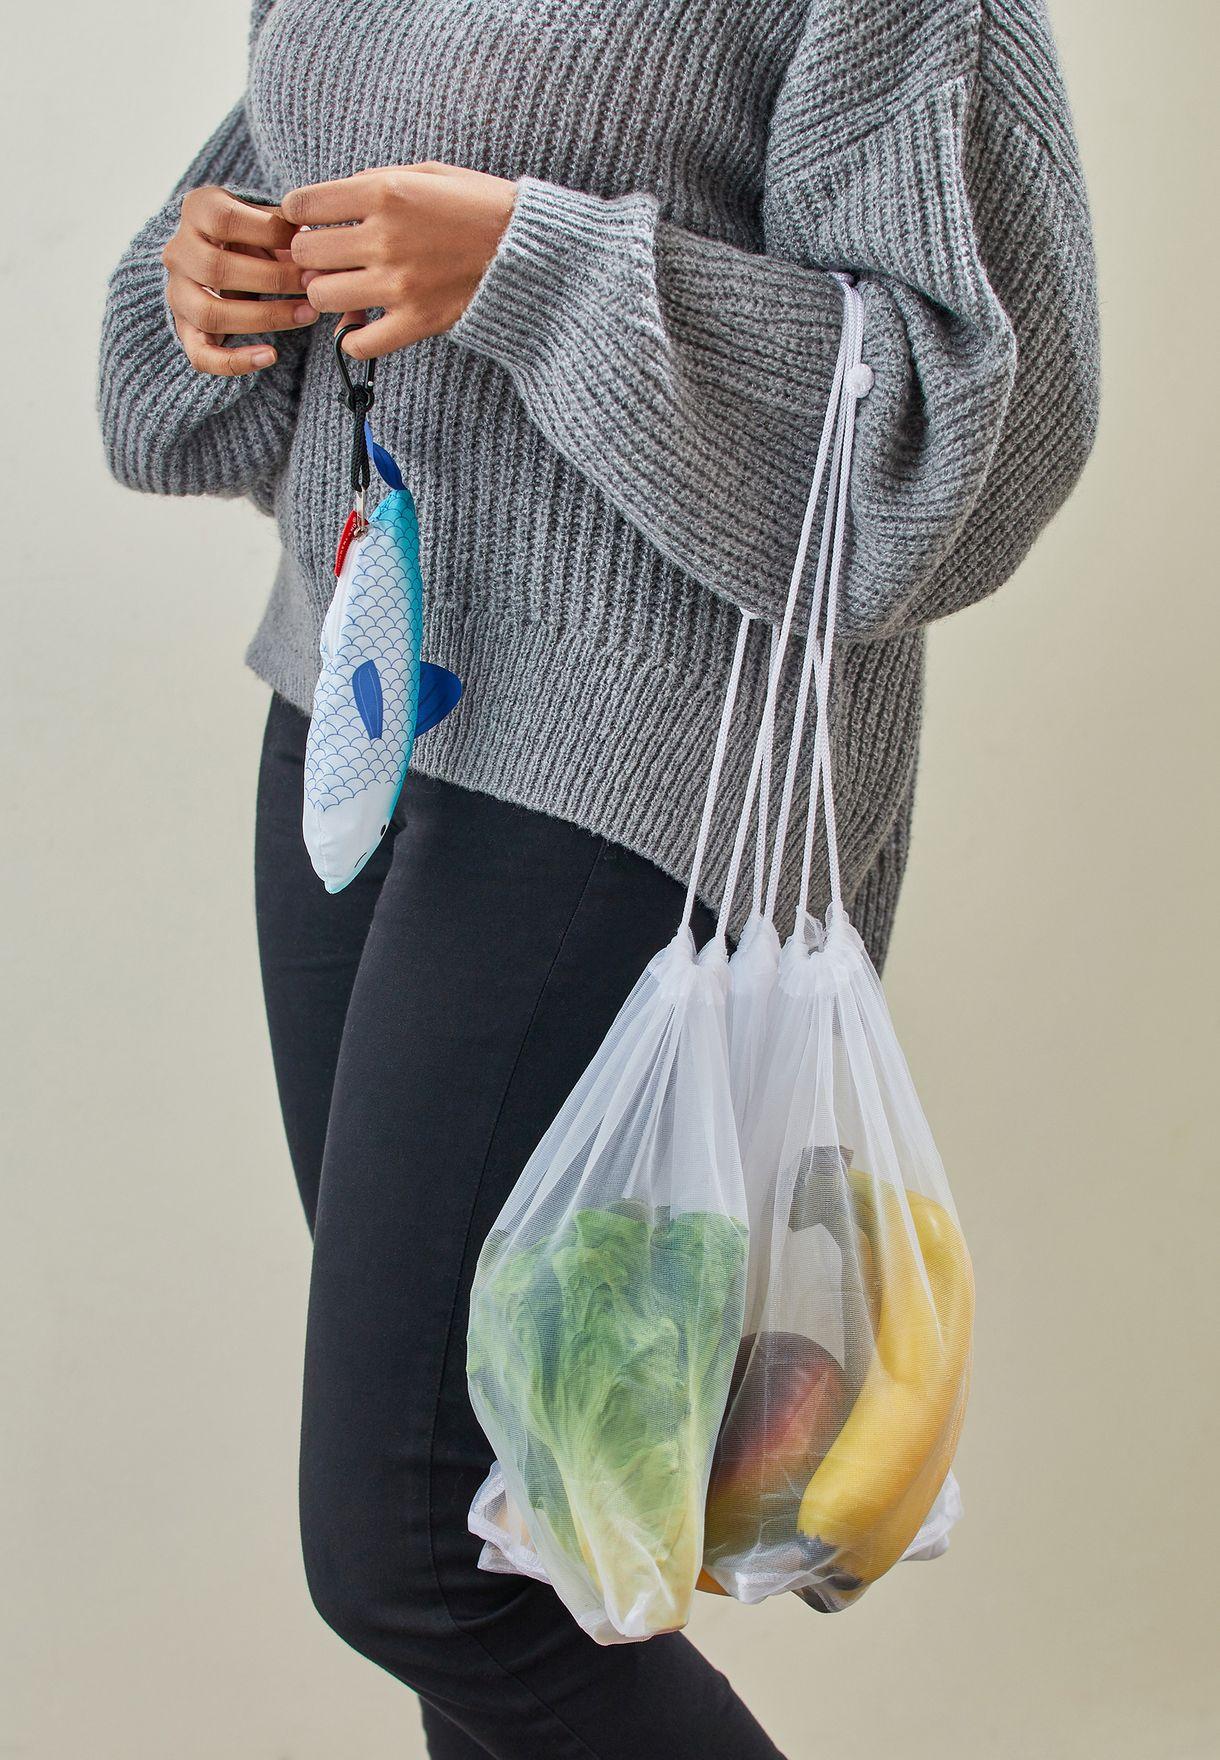 Fish Shaped Produce Bag